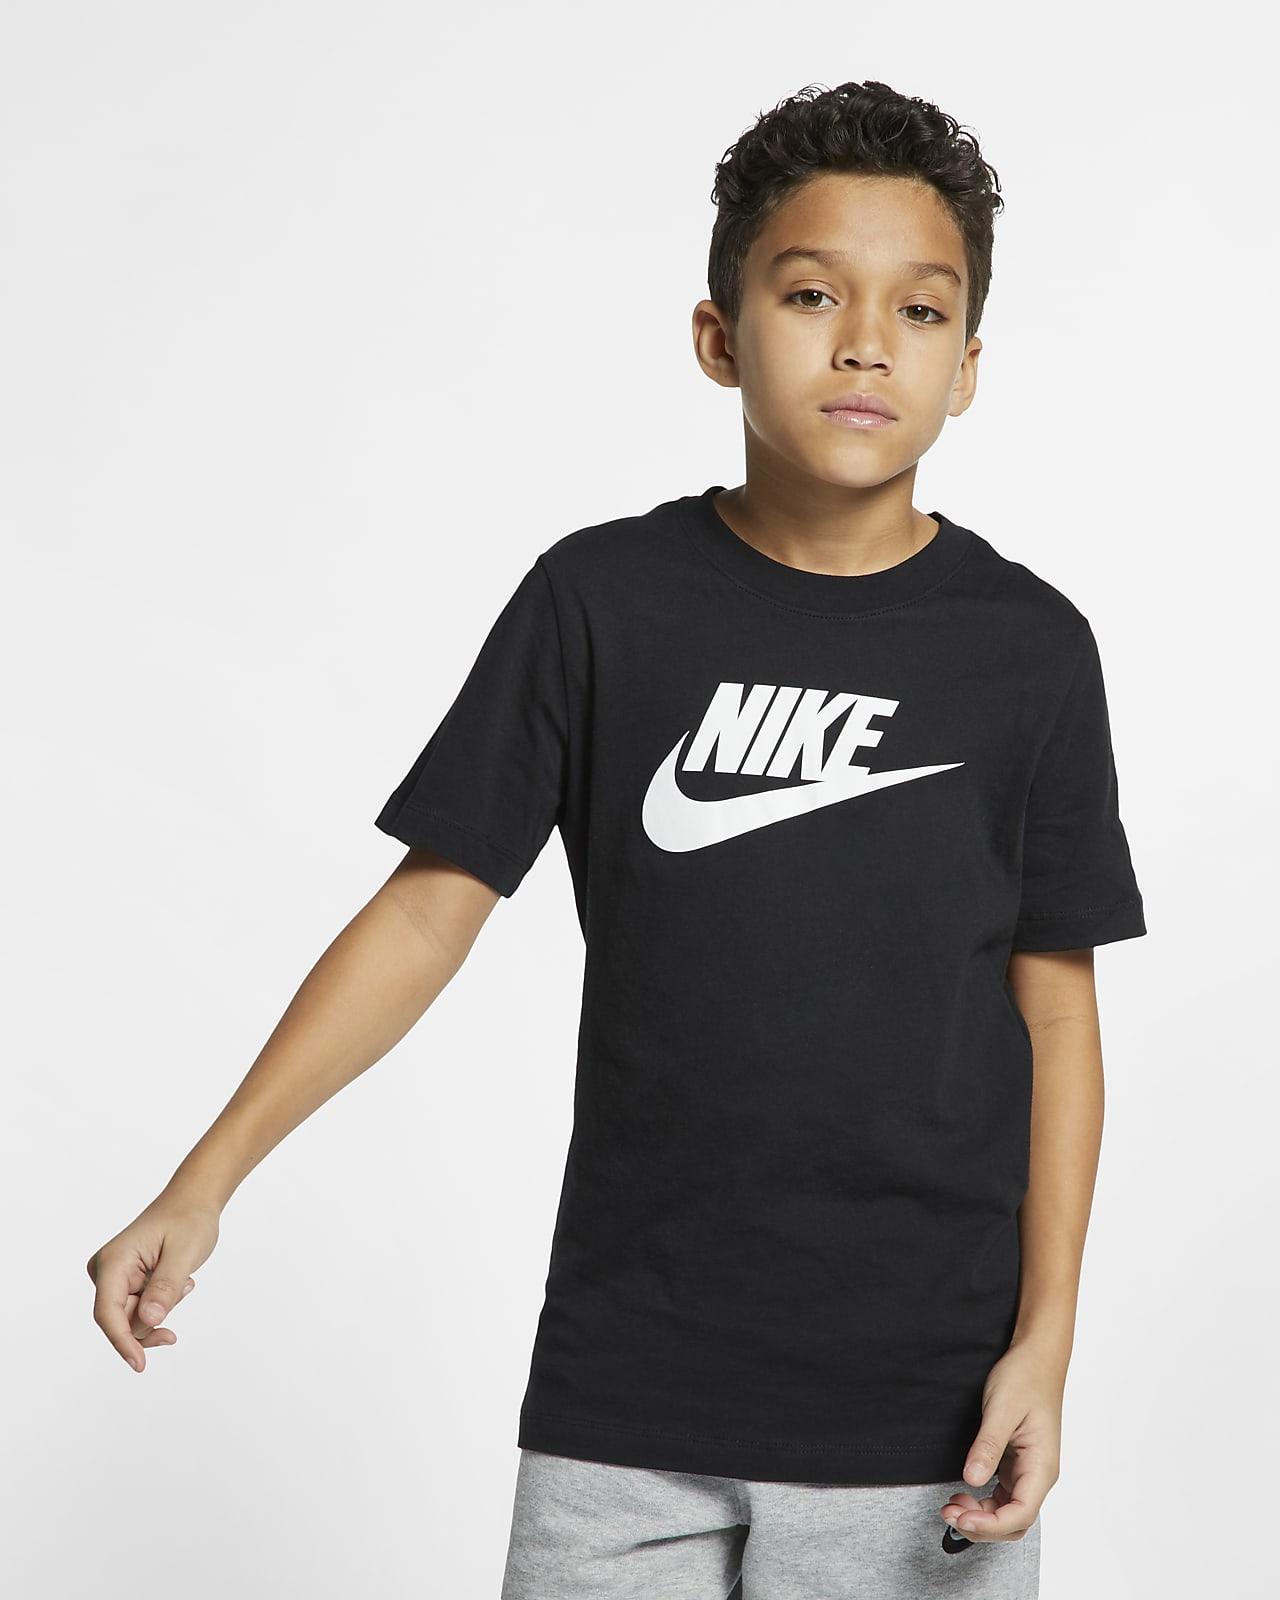 Bomulls-t-shirt Nike Sportswear för ungdom